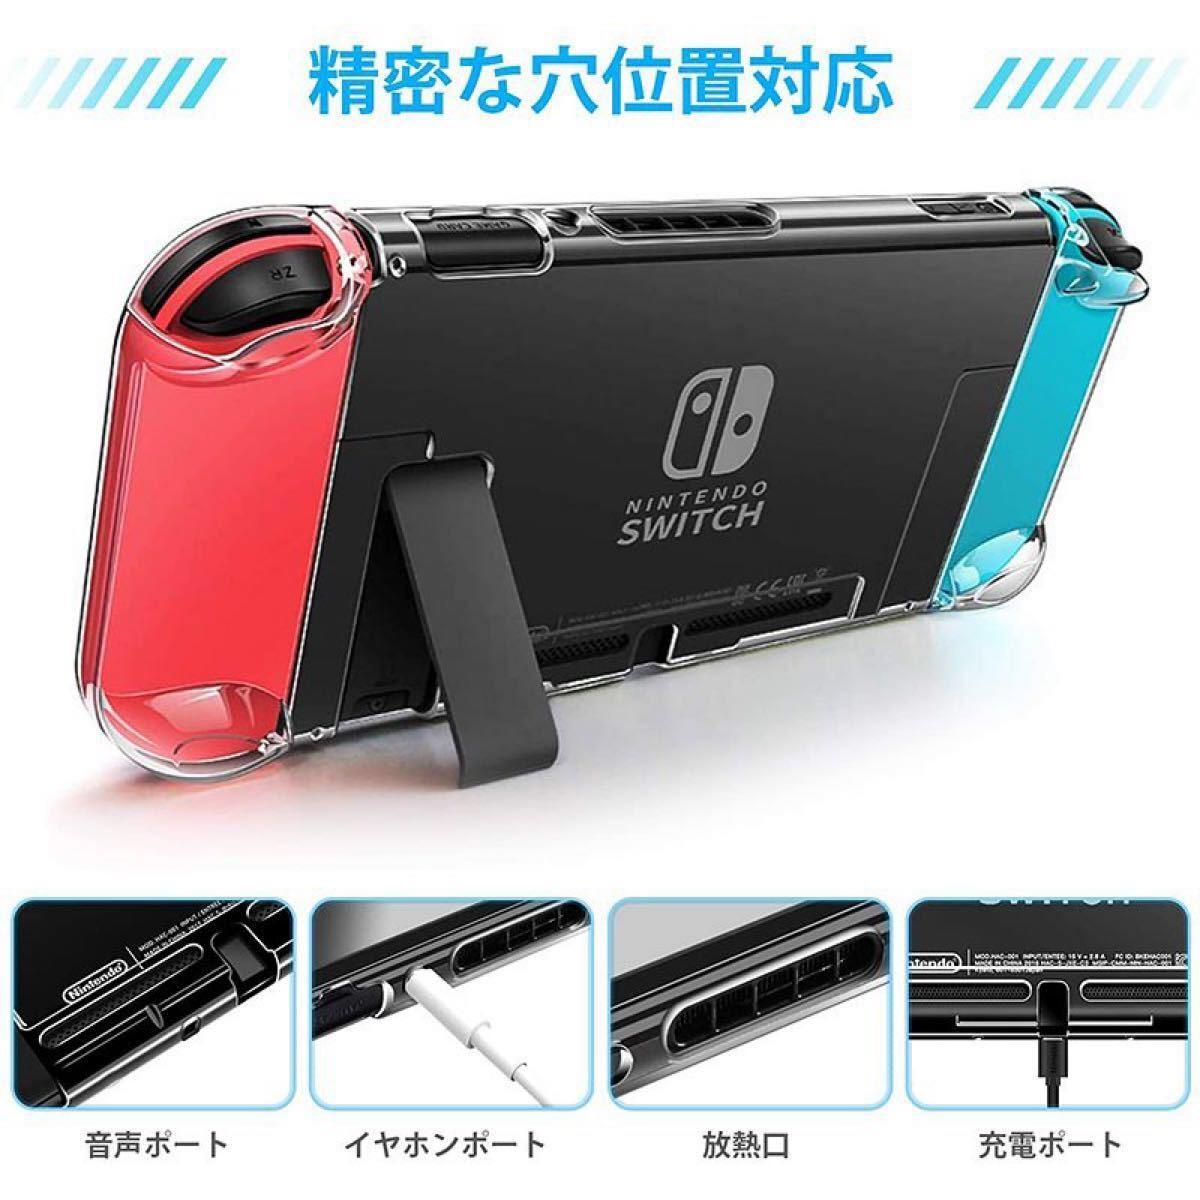 Nintendo Switch 保護透明ケース カバー翌日発送